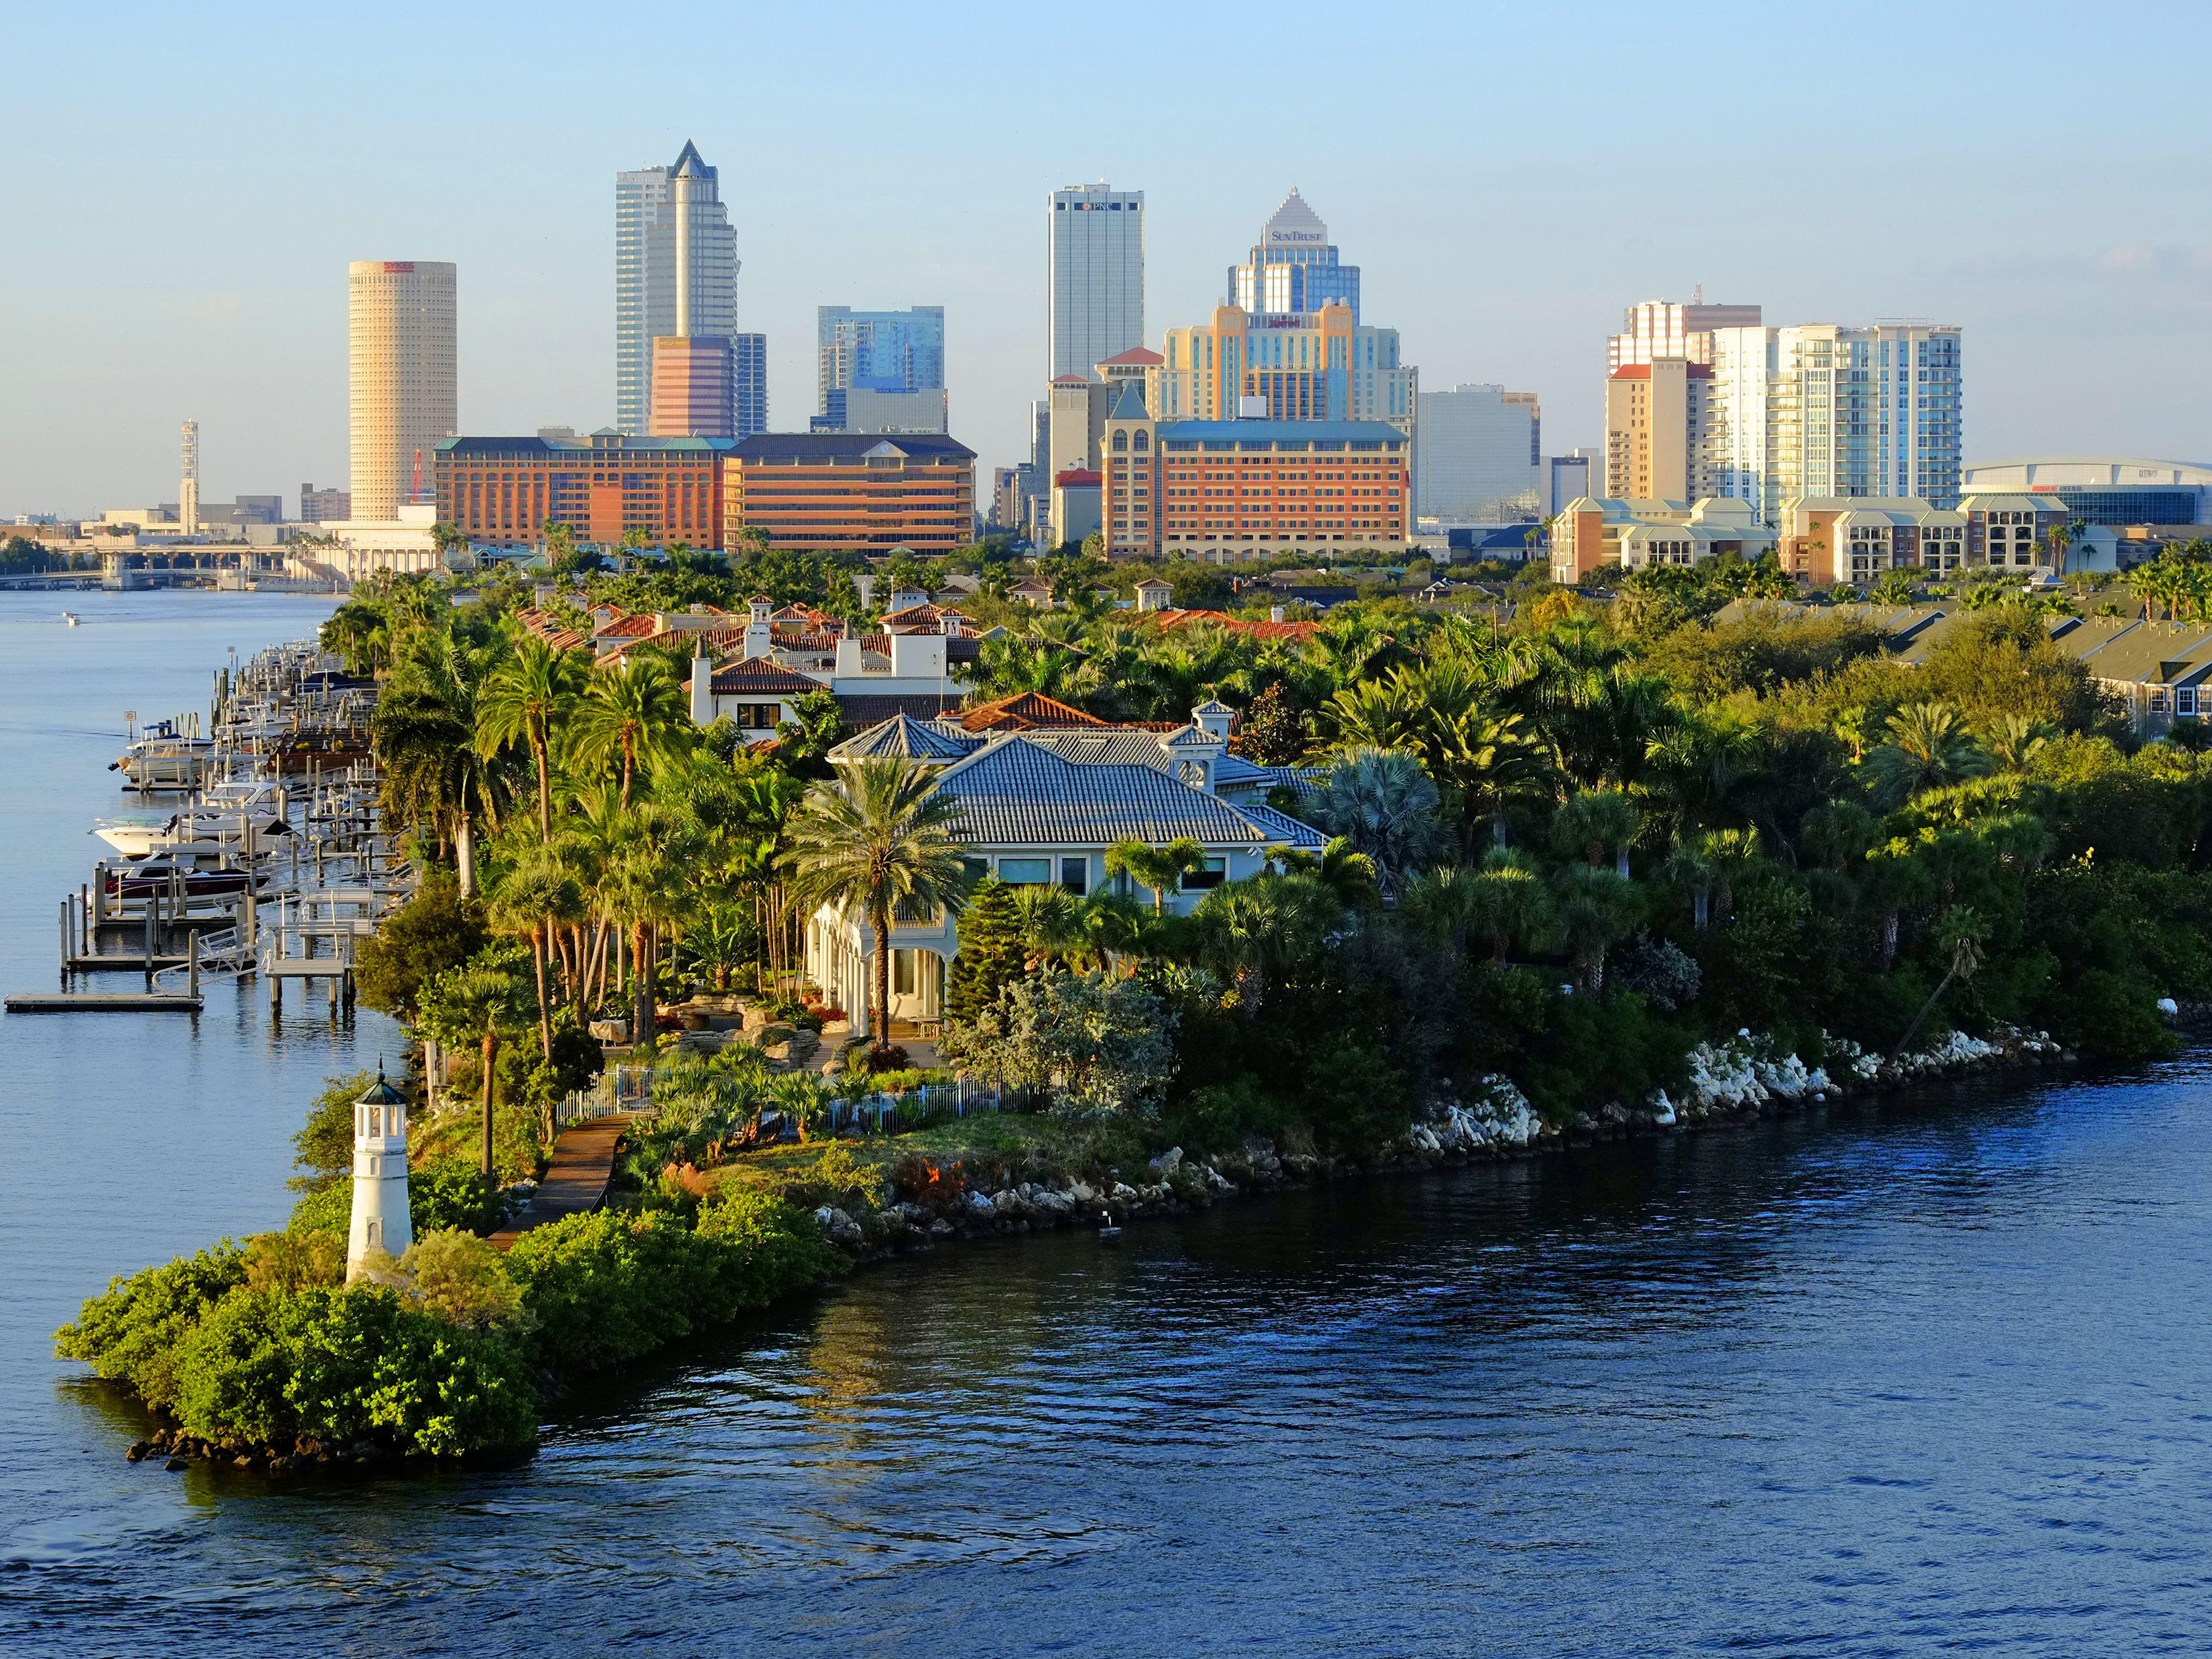 Average Temperature And Rainfall In Tampa Florida